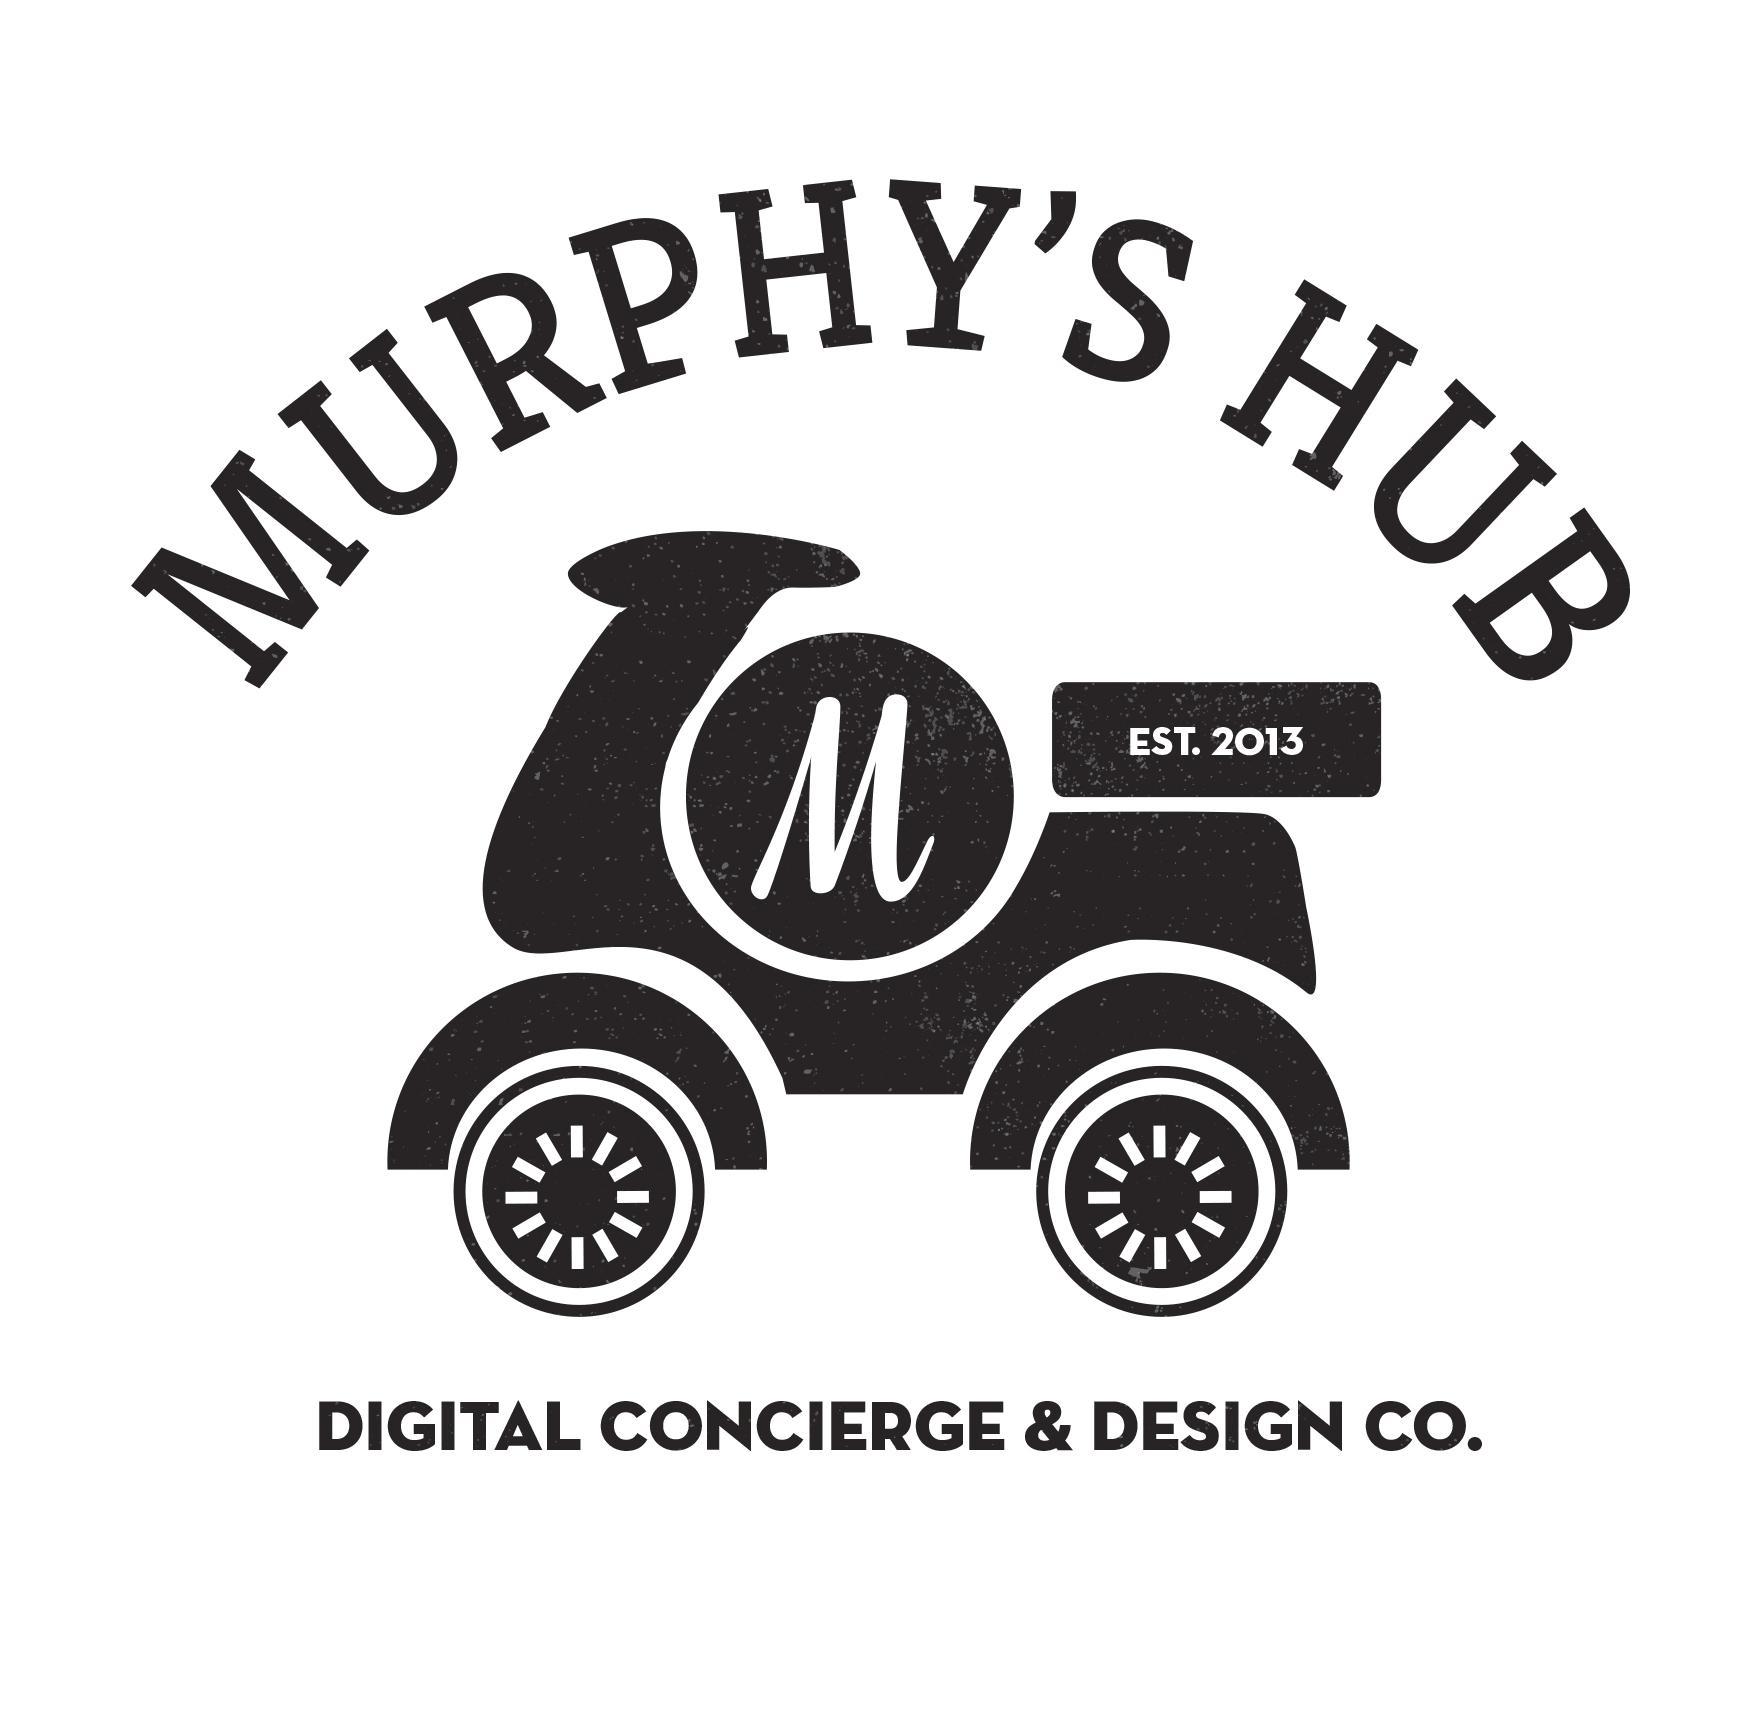 Murphy's Hub - image 2 - student project